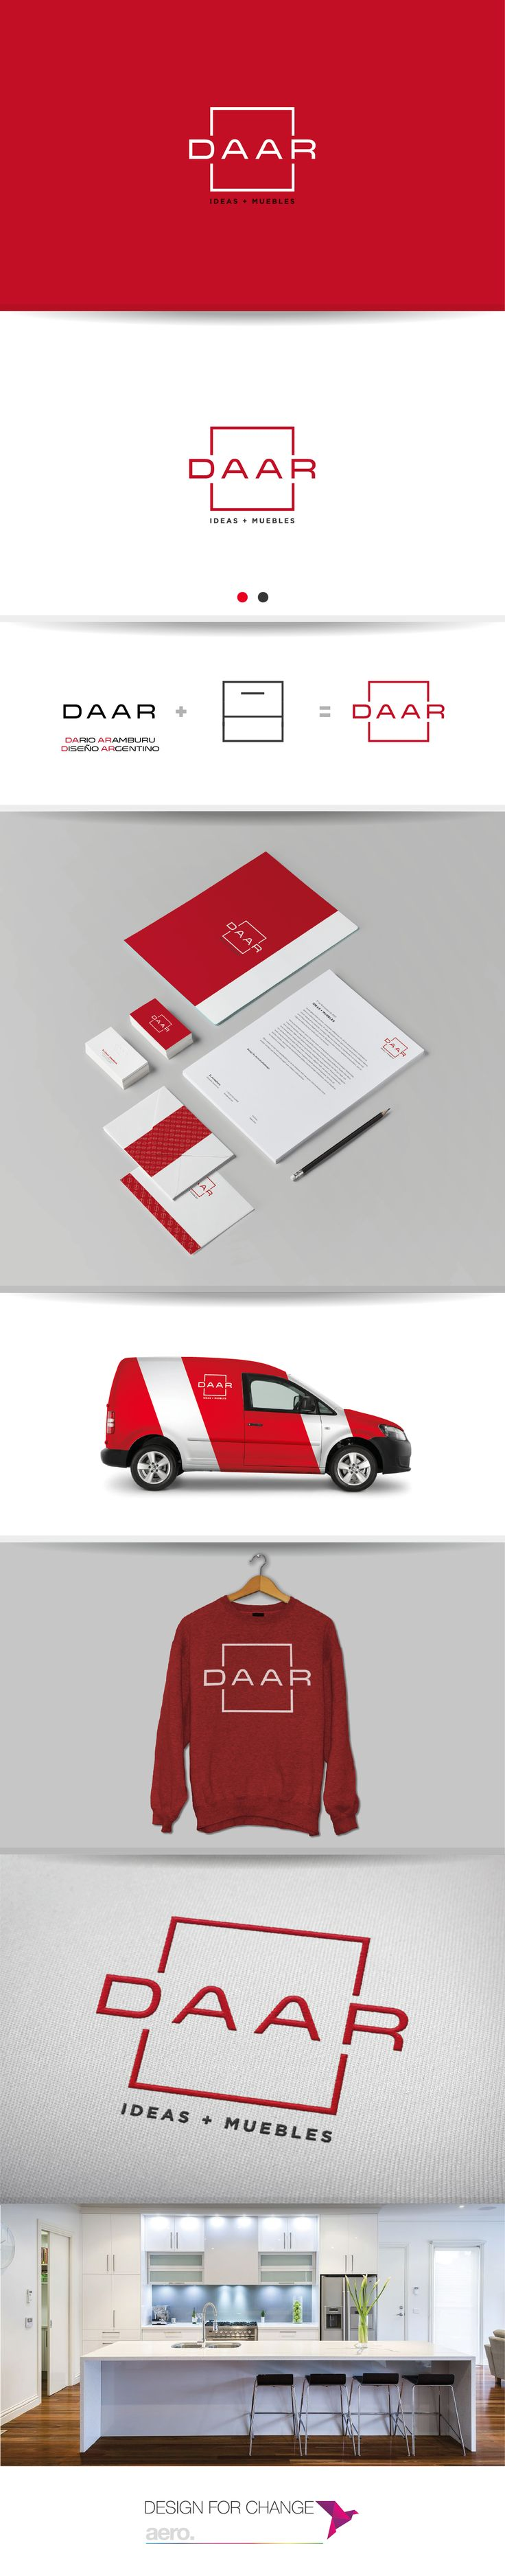 Corporate Image Design Studio Design Aero.  Diseño de Imagen Corporativa por…